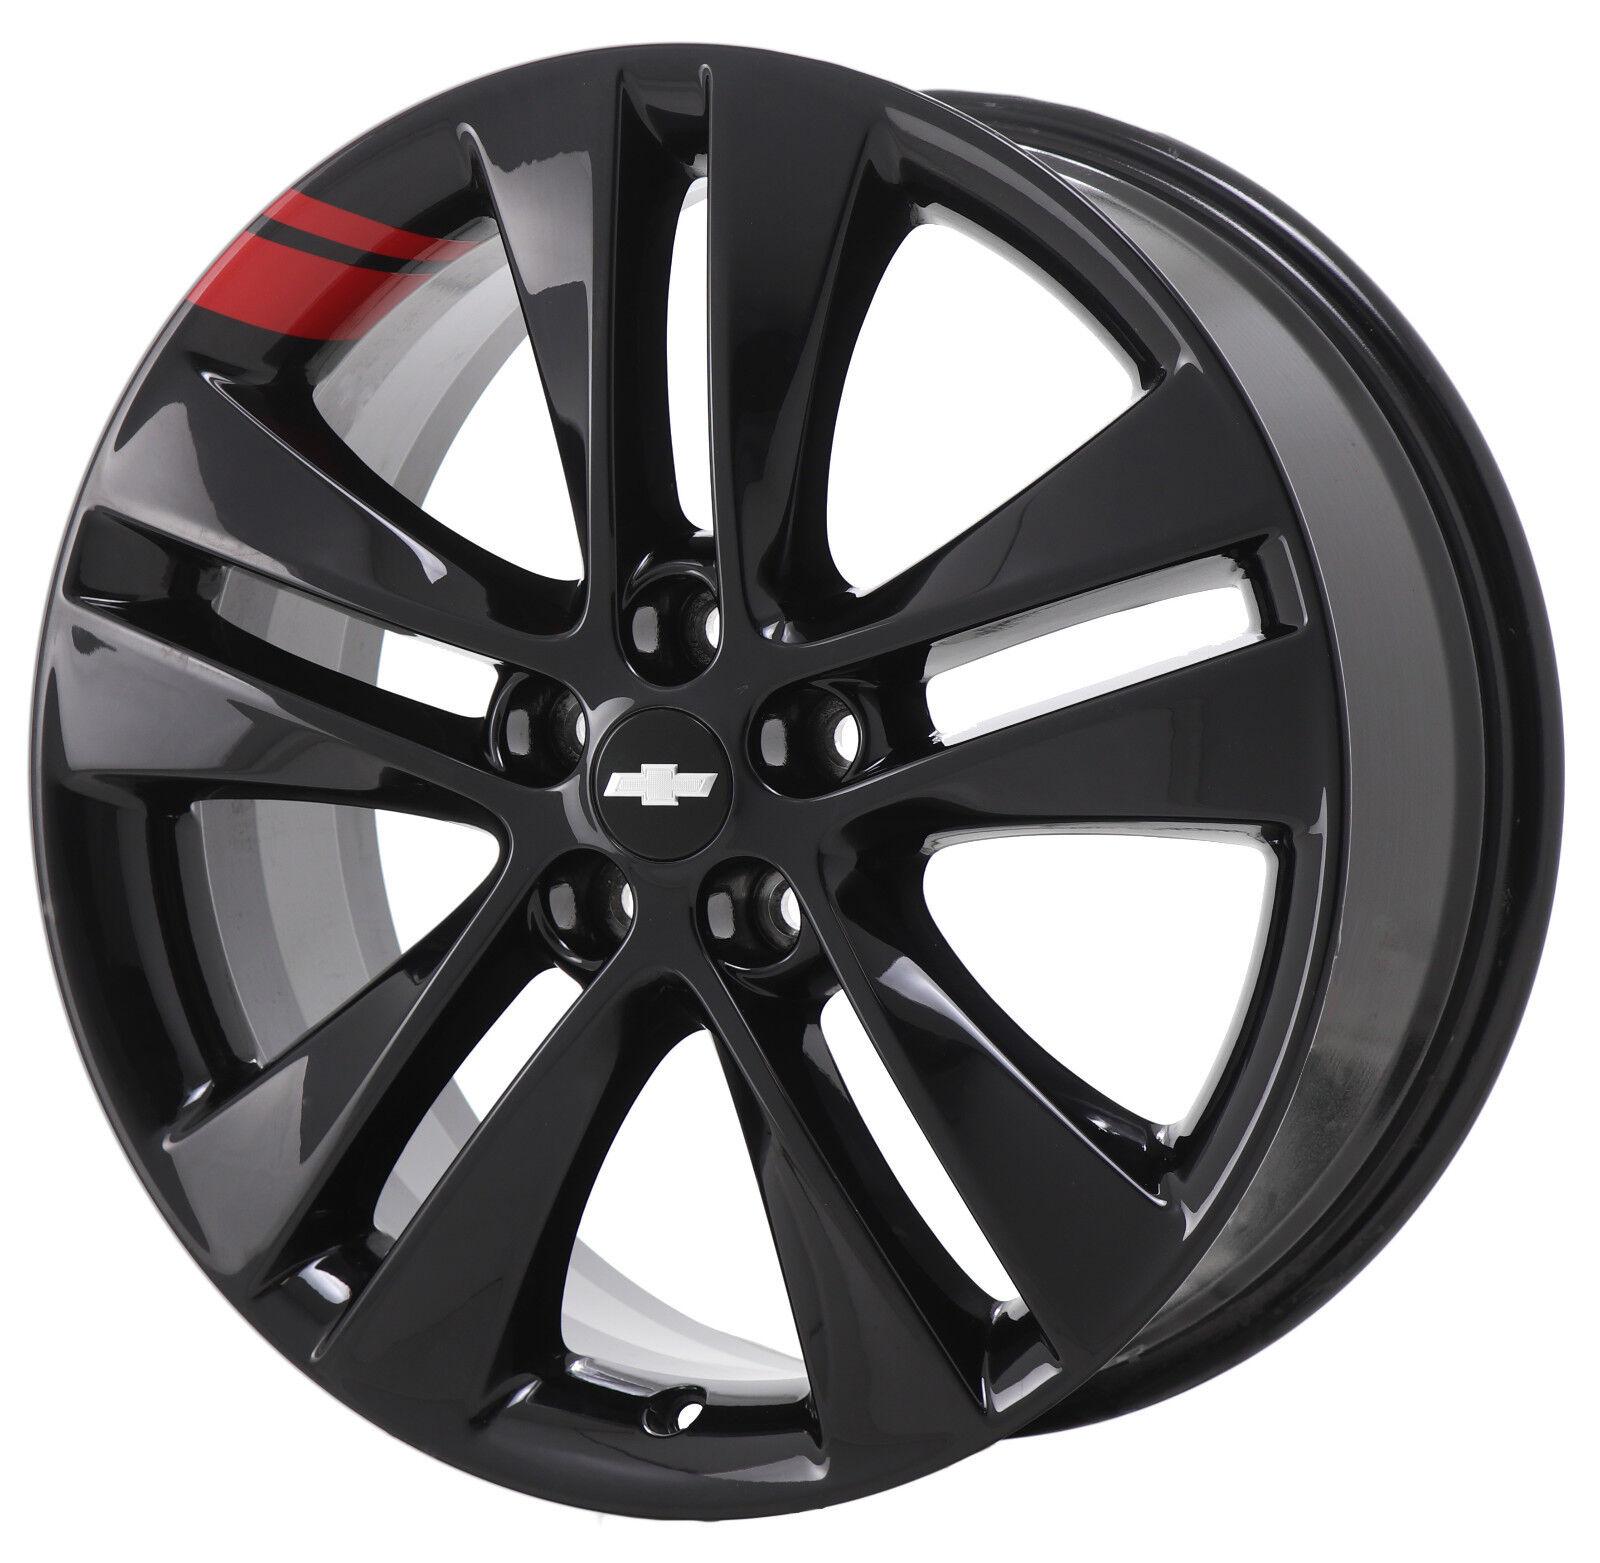 rim factory oem replacement chrome bright wheels stock pvd used wheel hol set trax chevrolet rims